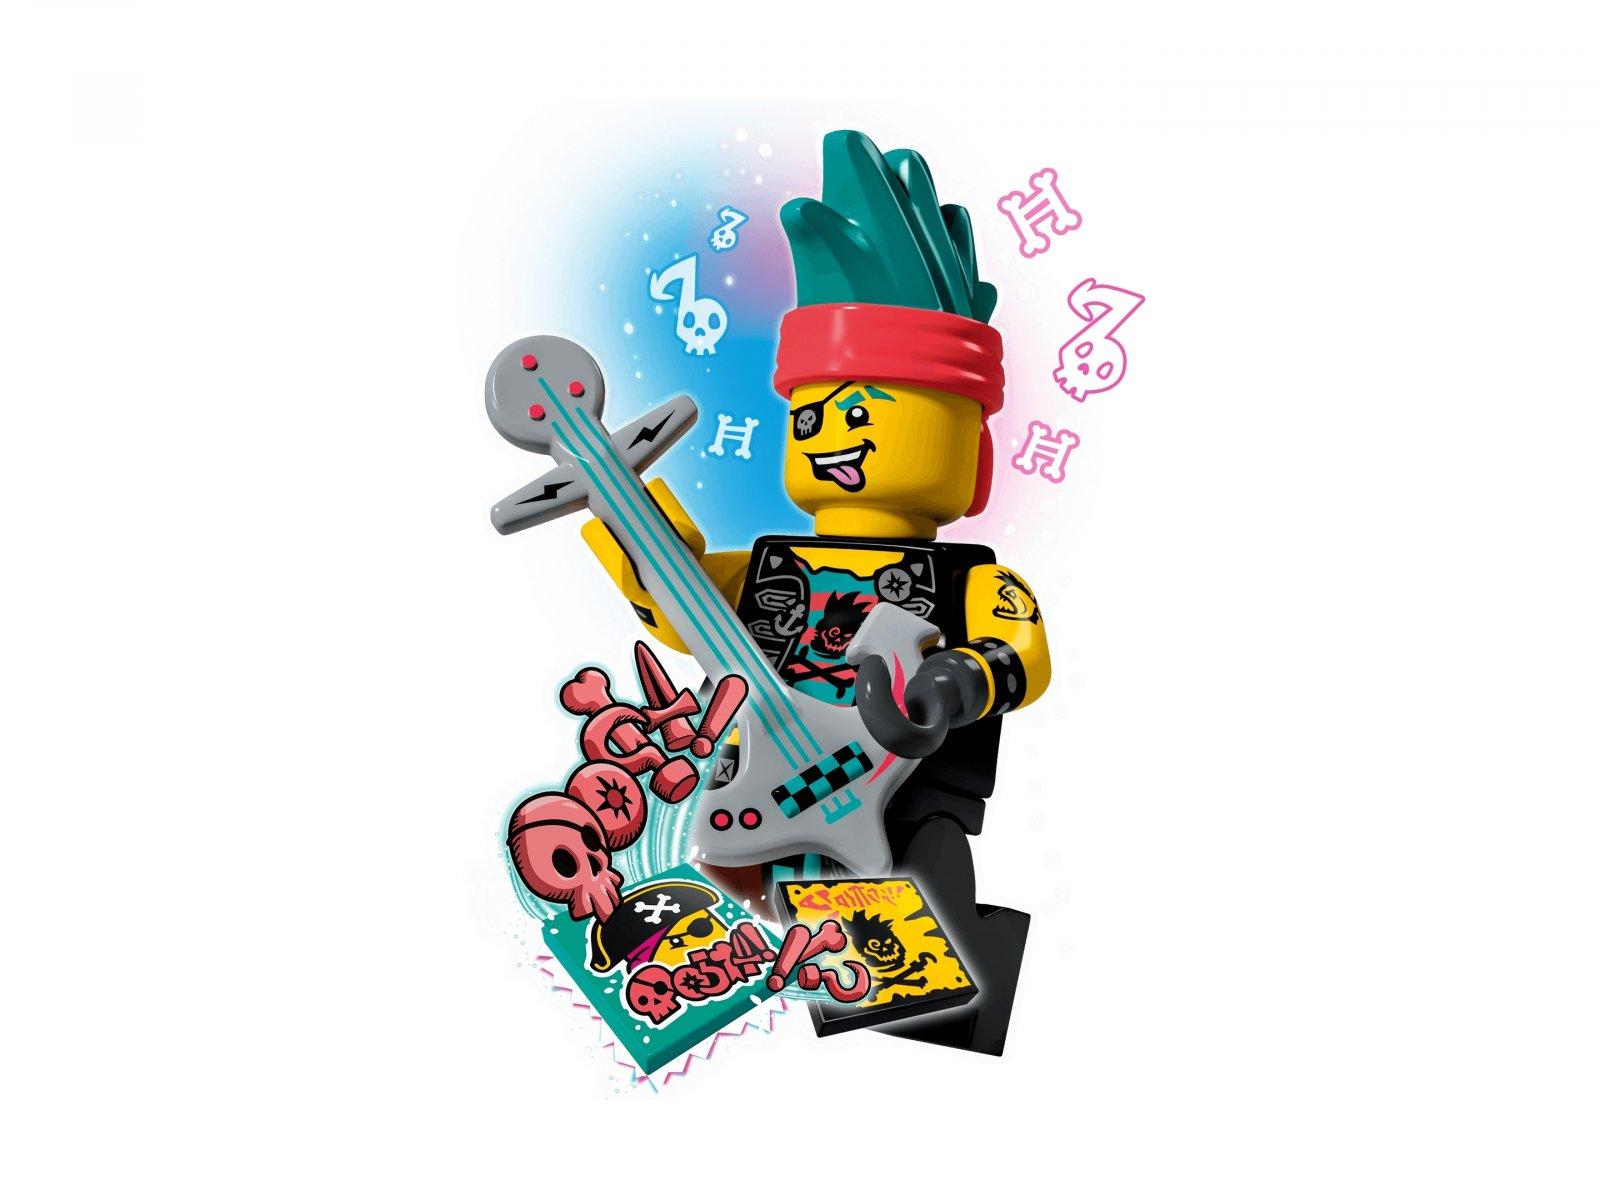 LEGO 43103 VIDIYO Punk Pirate BeatBox